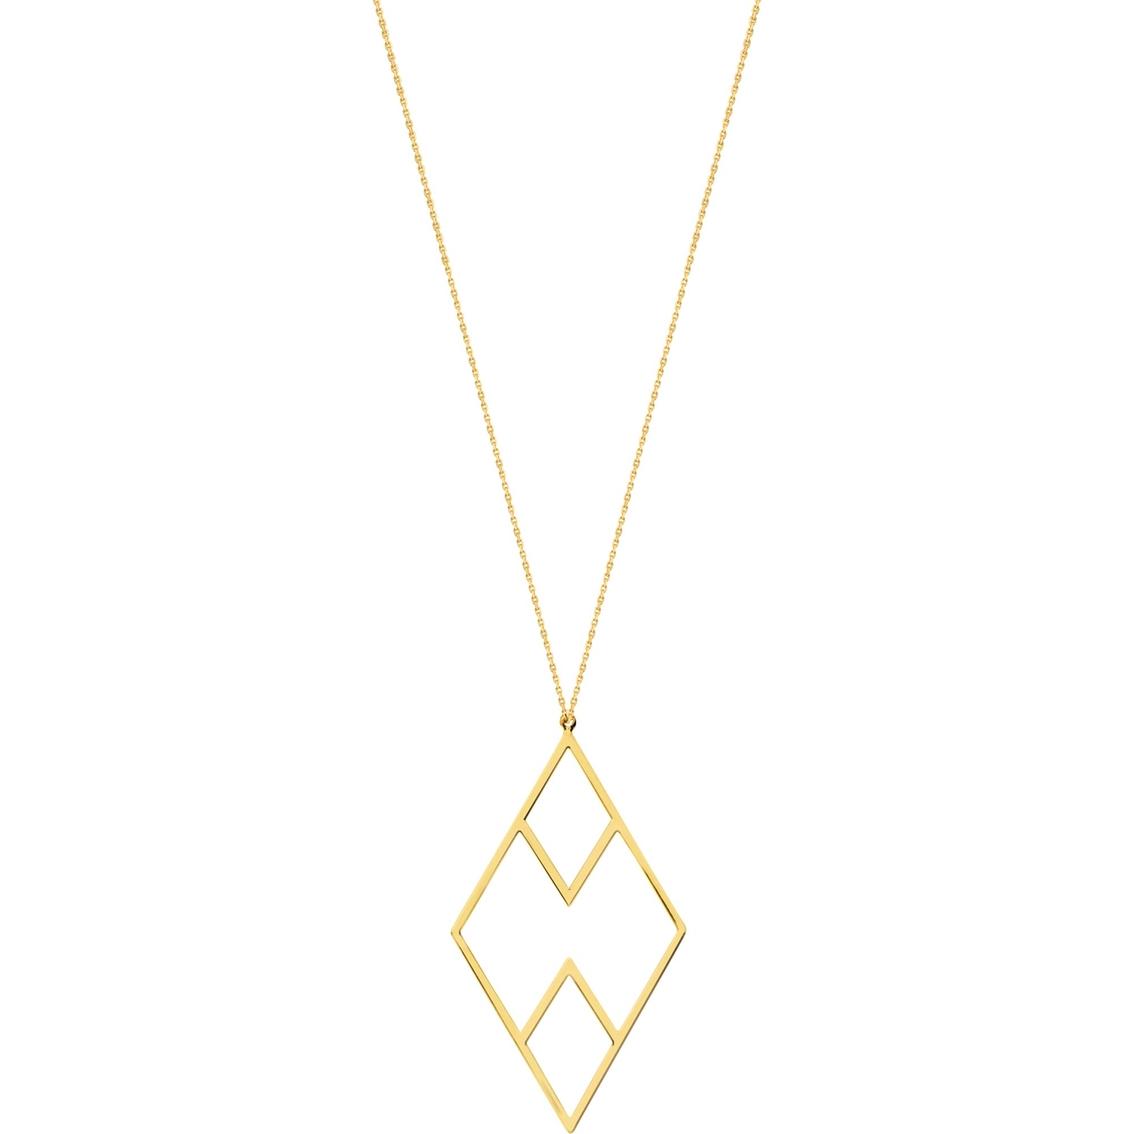 14K Yellow Gold Draw Line Geometric Necklace